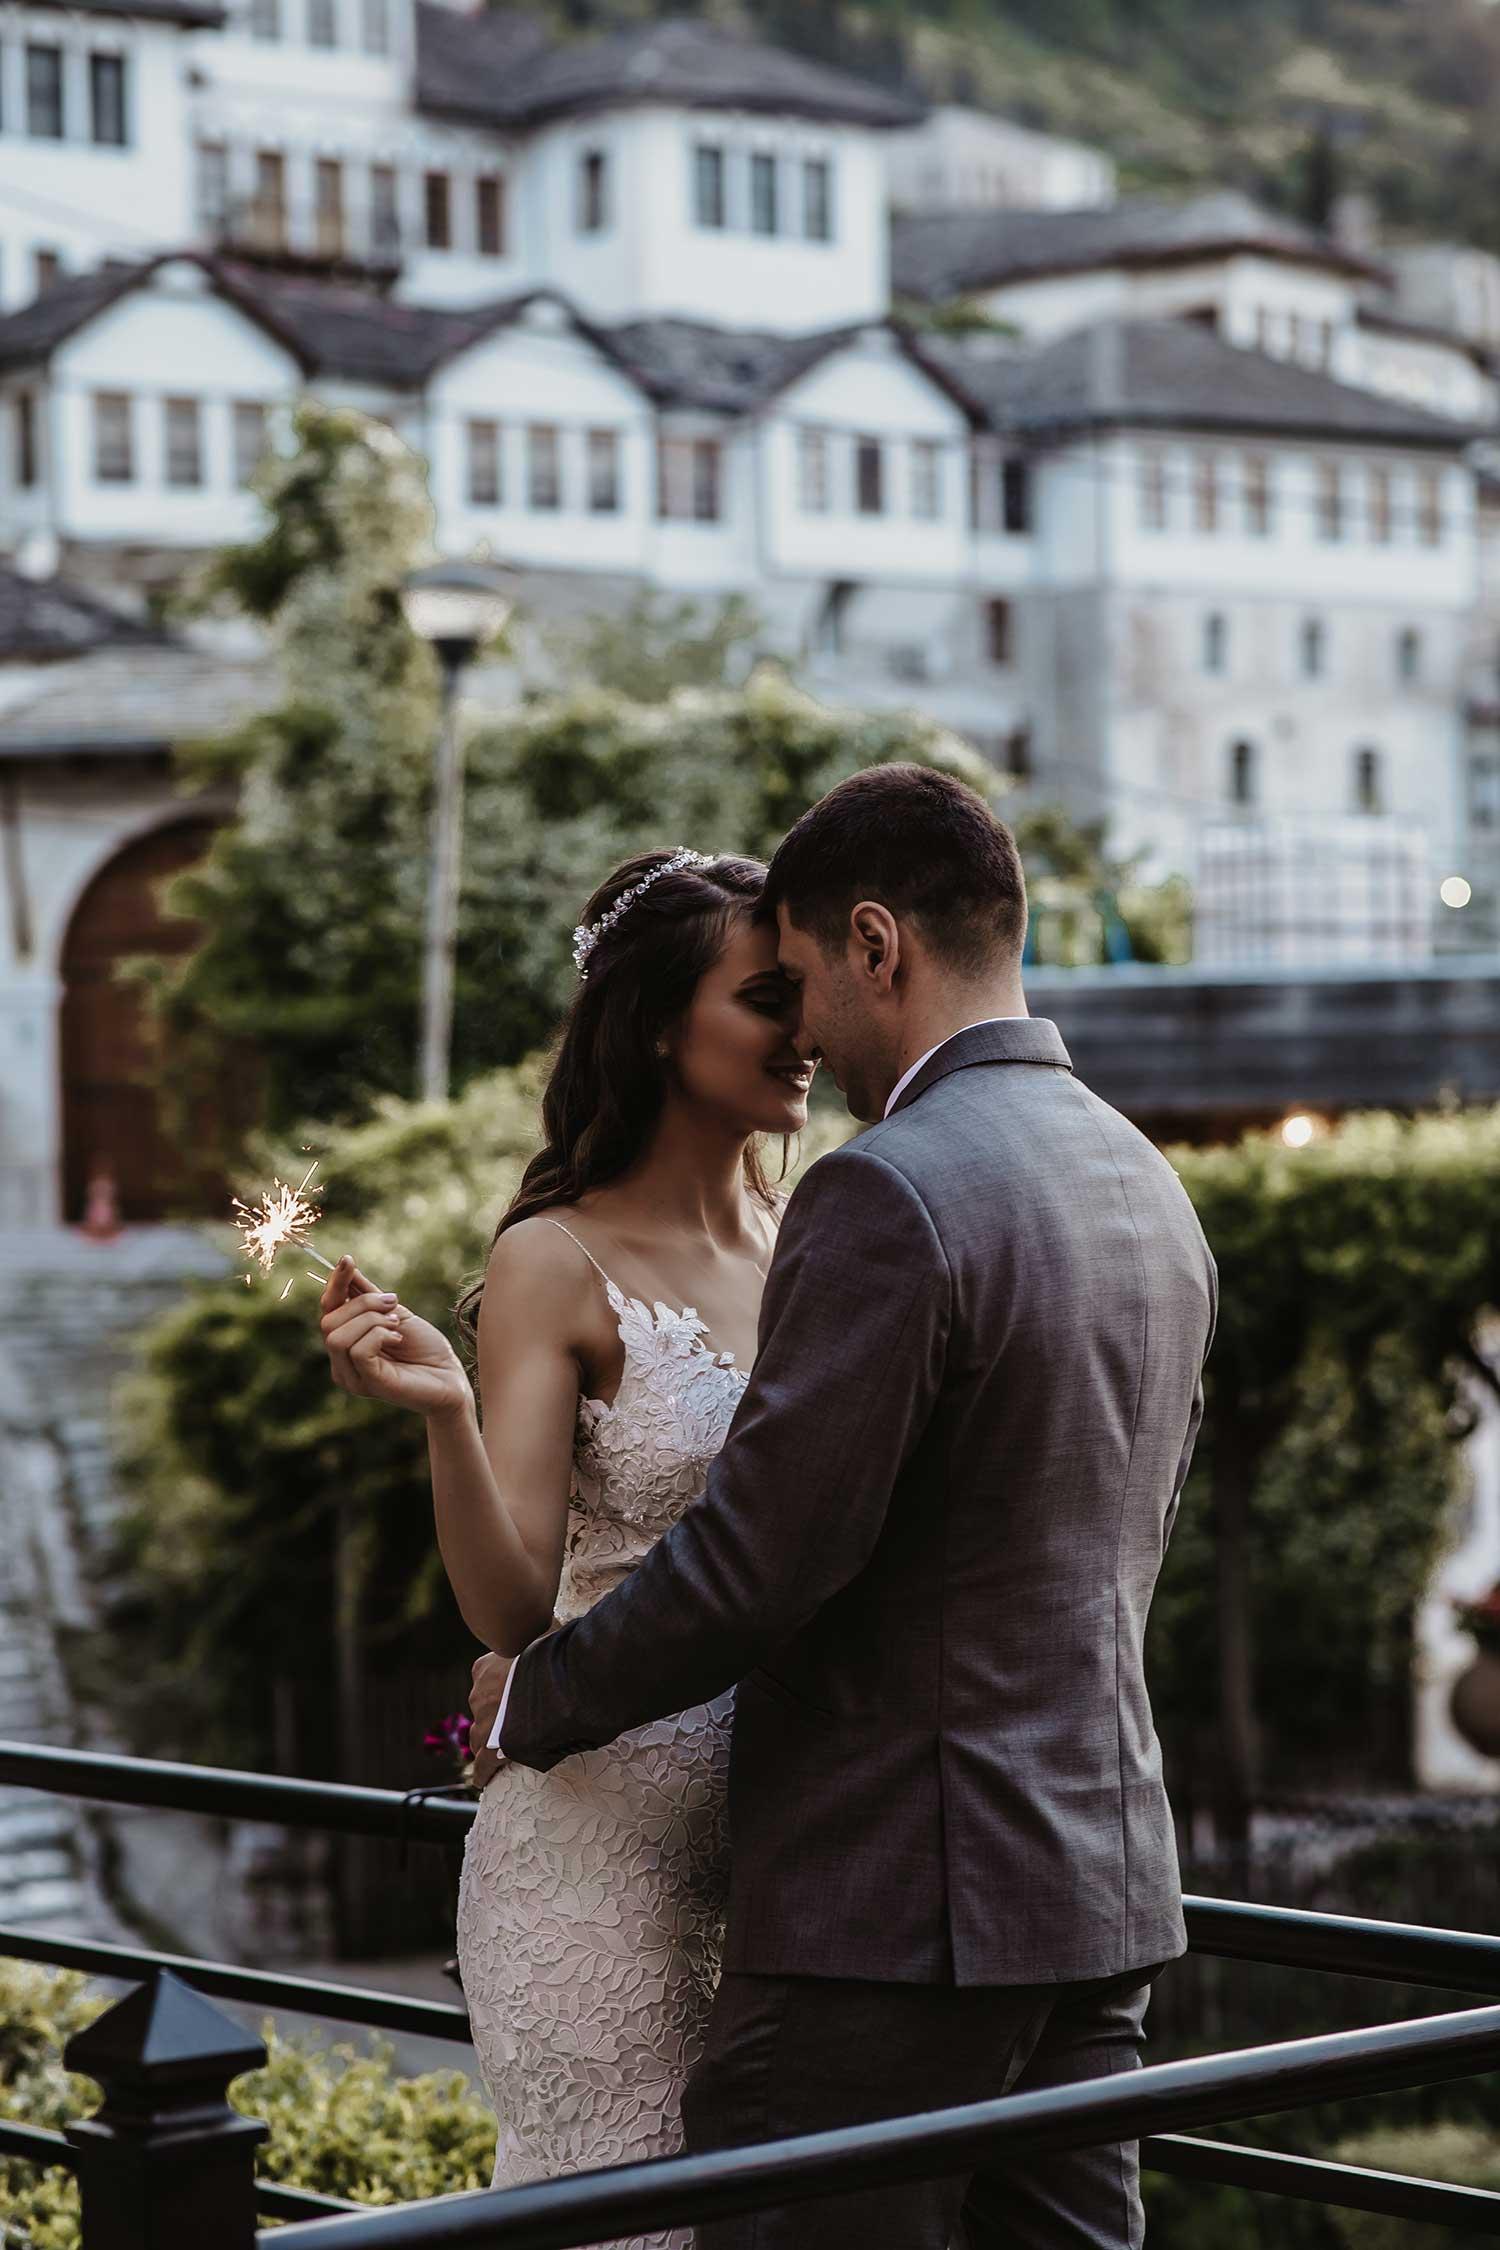 Couple sharing their love in Gjirokaster